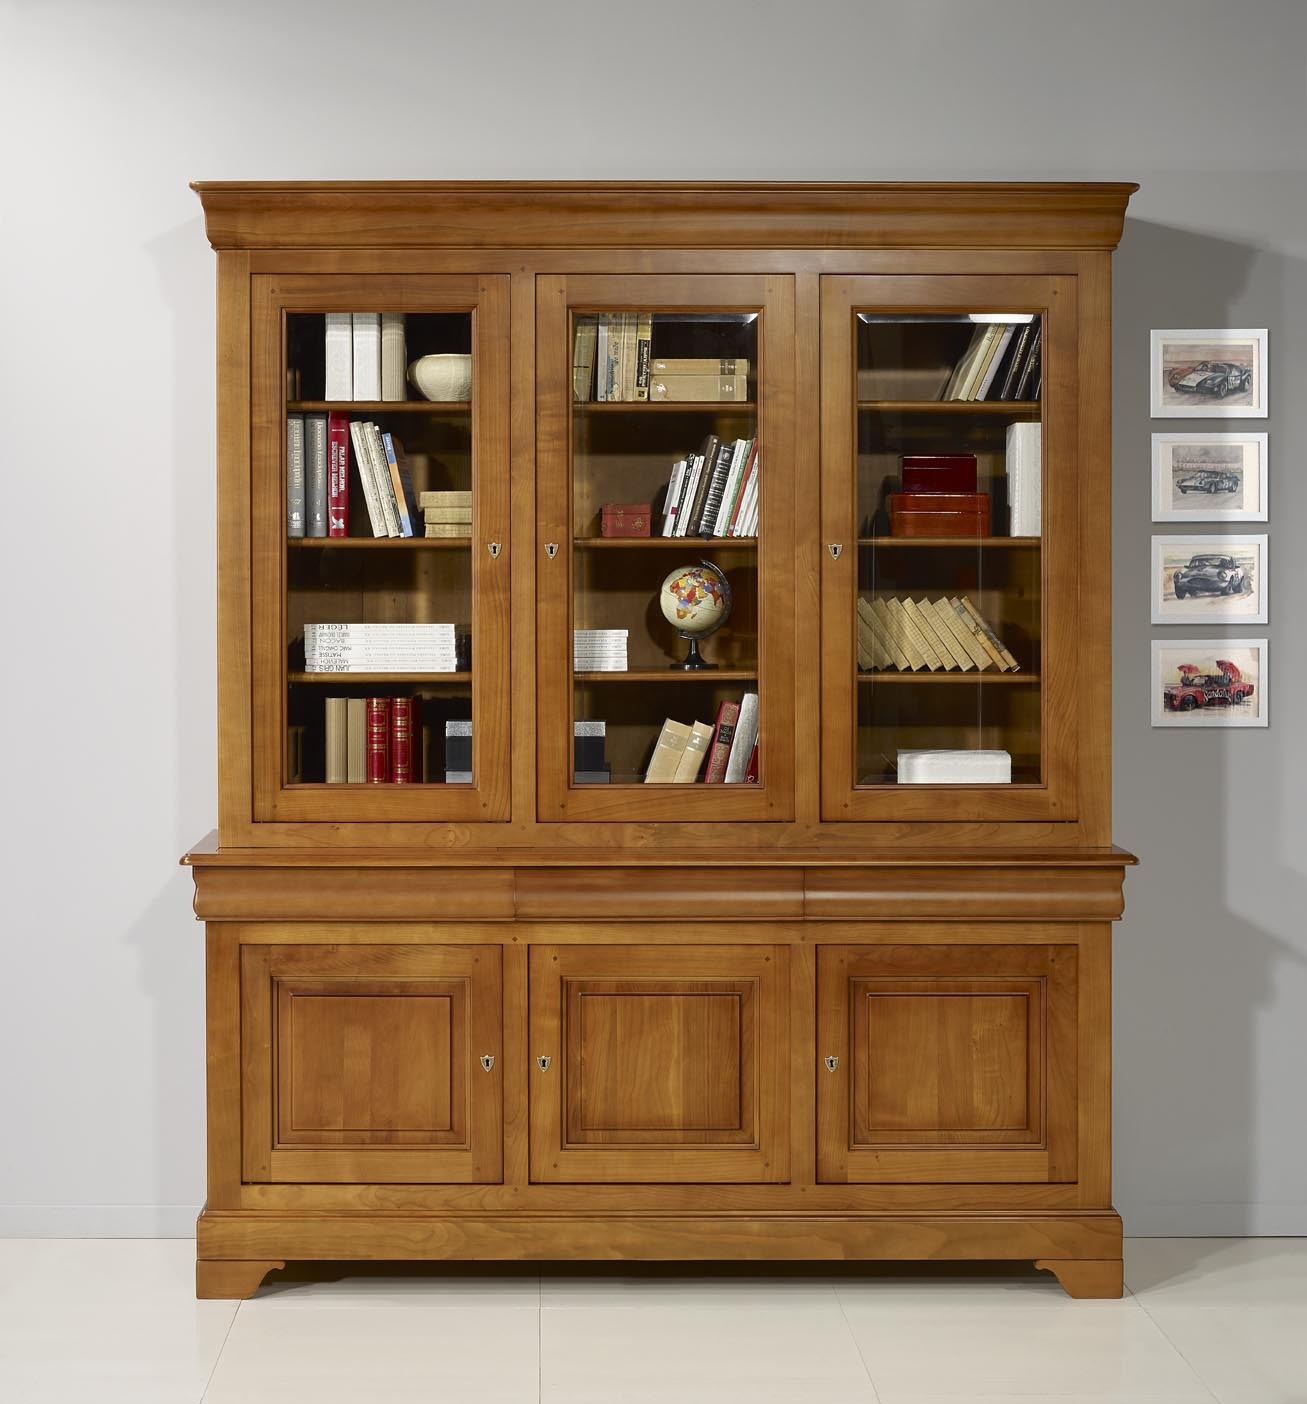 biblioth que 2 corps 3 portes en merisier massif de style louis philippe meuble en merisier massif. Black Bedroom Furniture Sets. Home Design Ideas